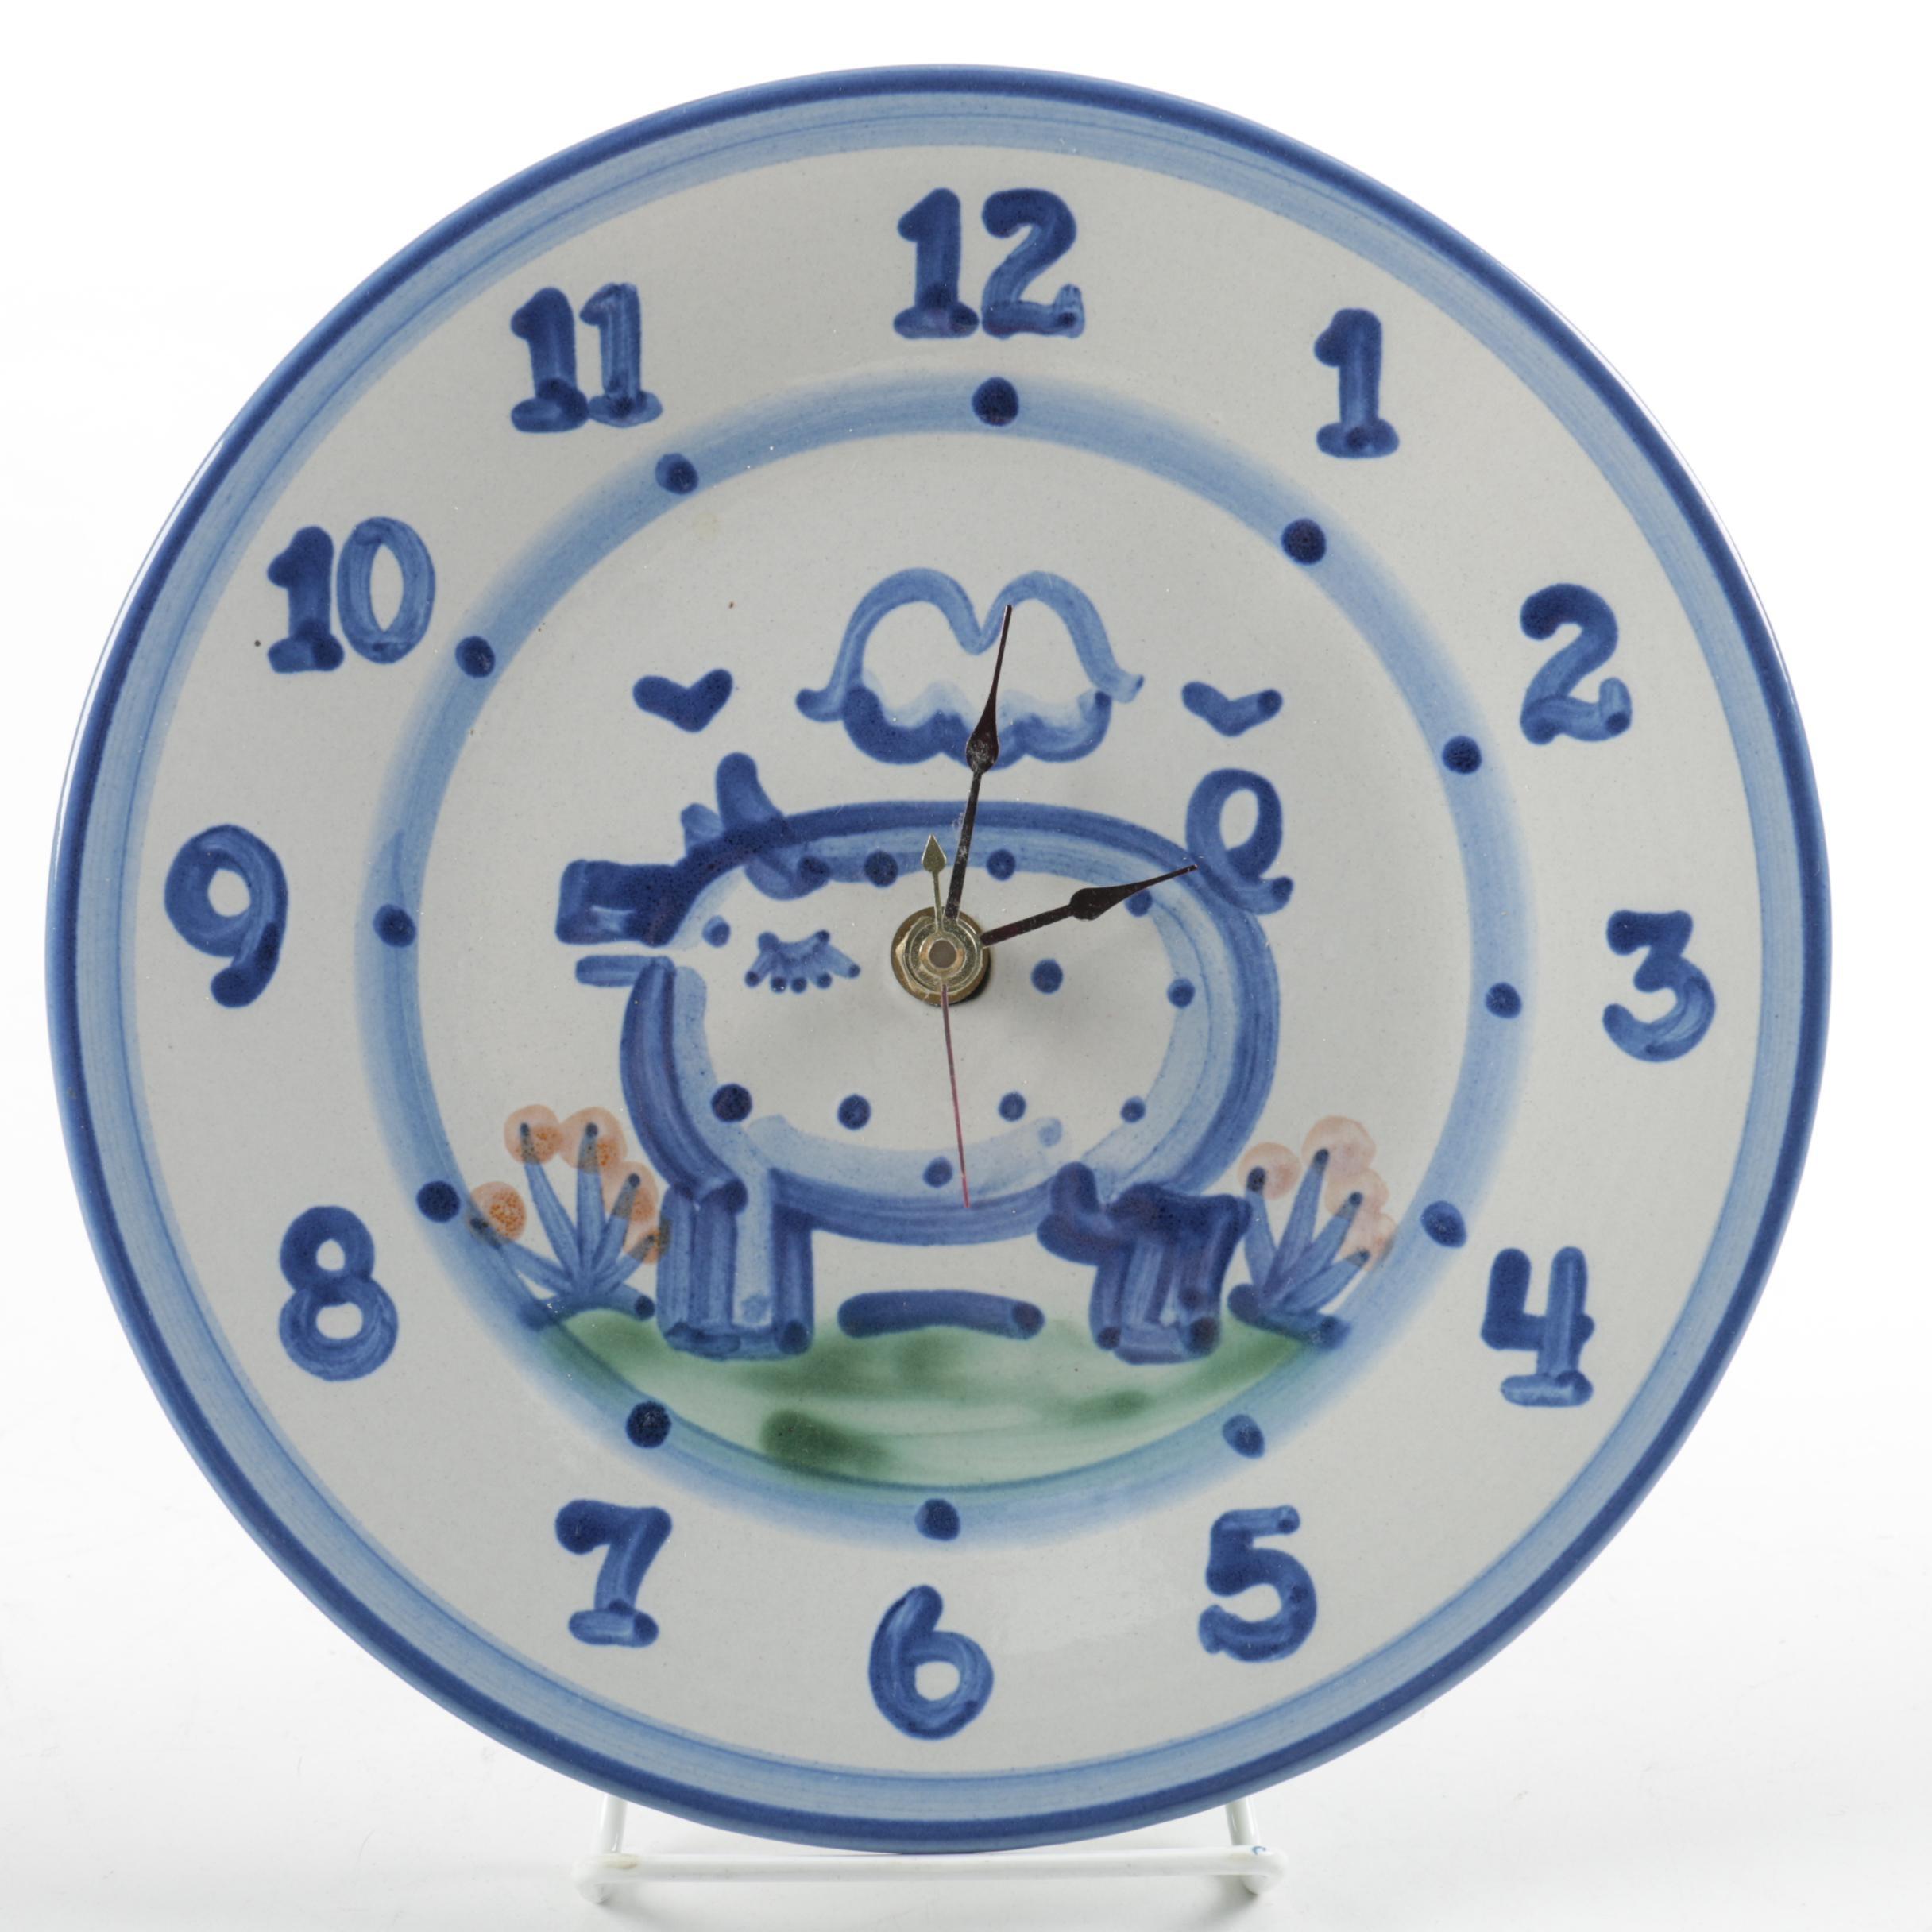 M.A. Hadley Ceramic Plate Wall Clock